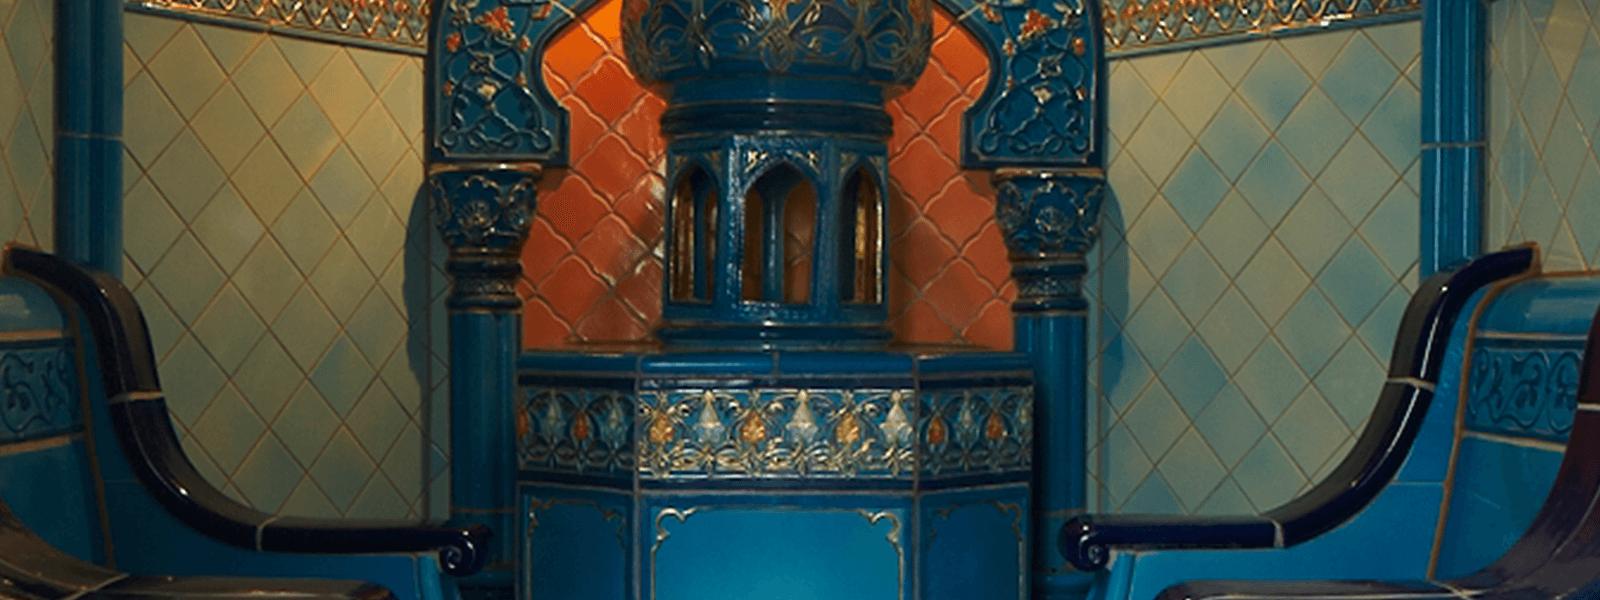 Blick in das orientalische Rasulbad